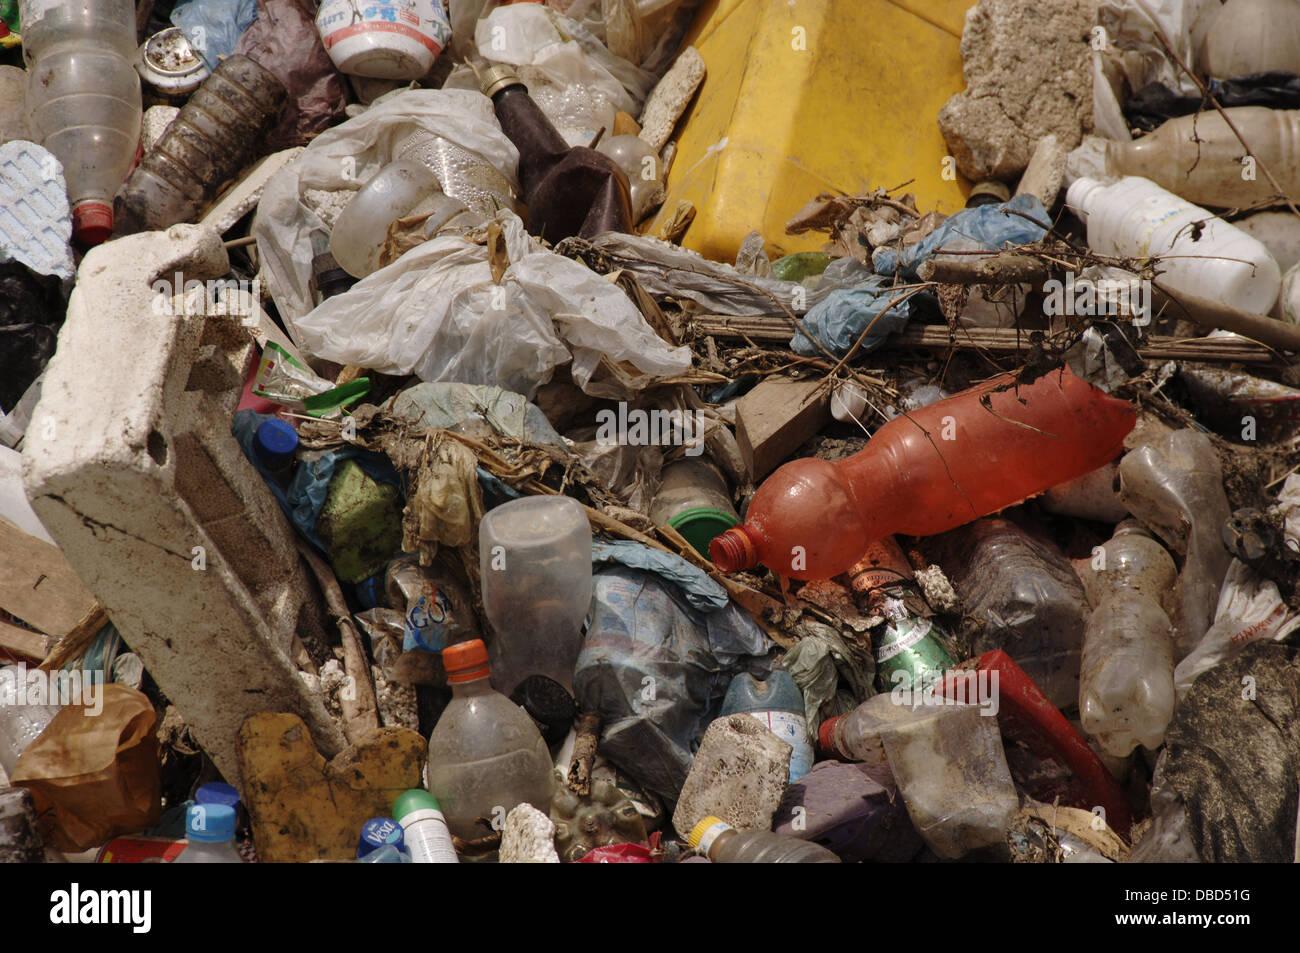 Contamination. Garbage. Lana river. Tirana. Albania. - Stock Image